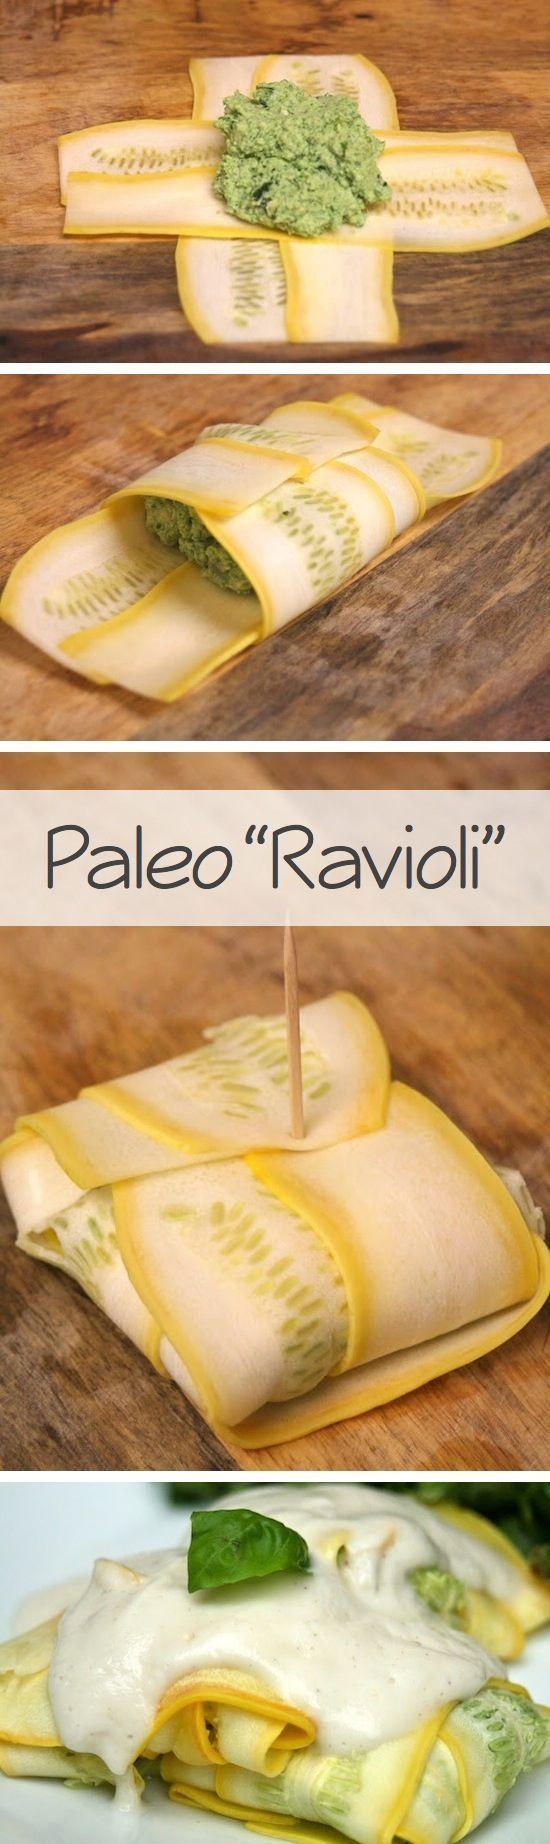 "Top 10 Healthy Recipes Paleo ""Ravioli"""